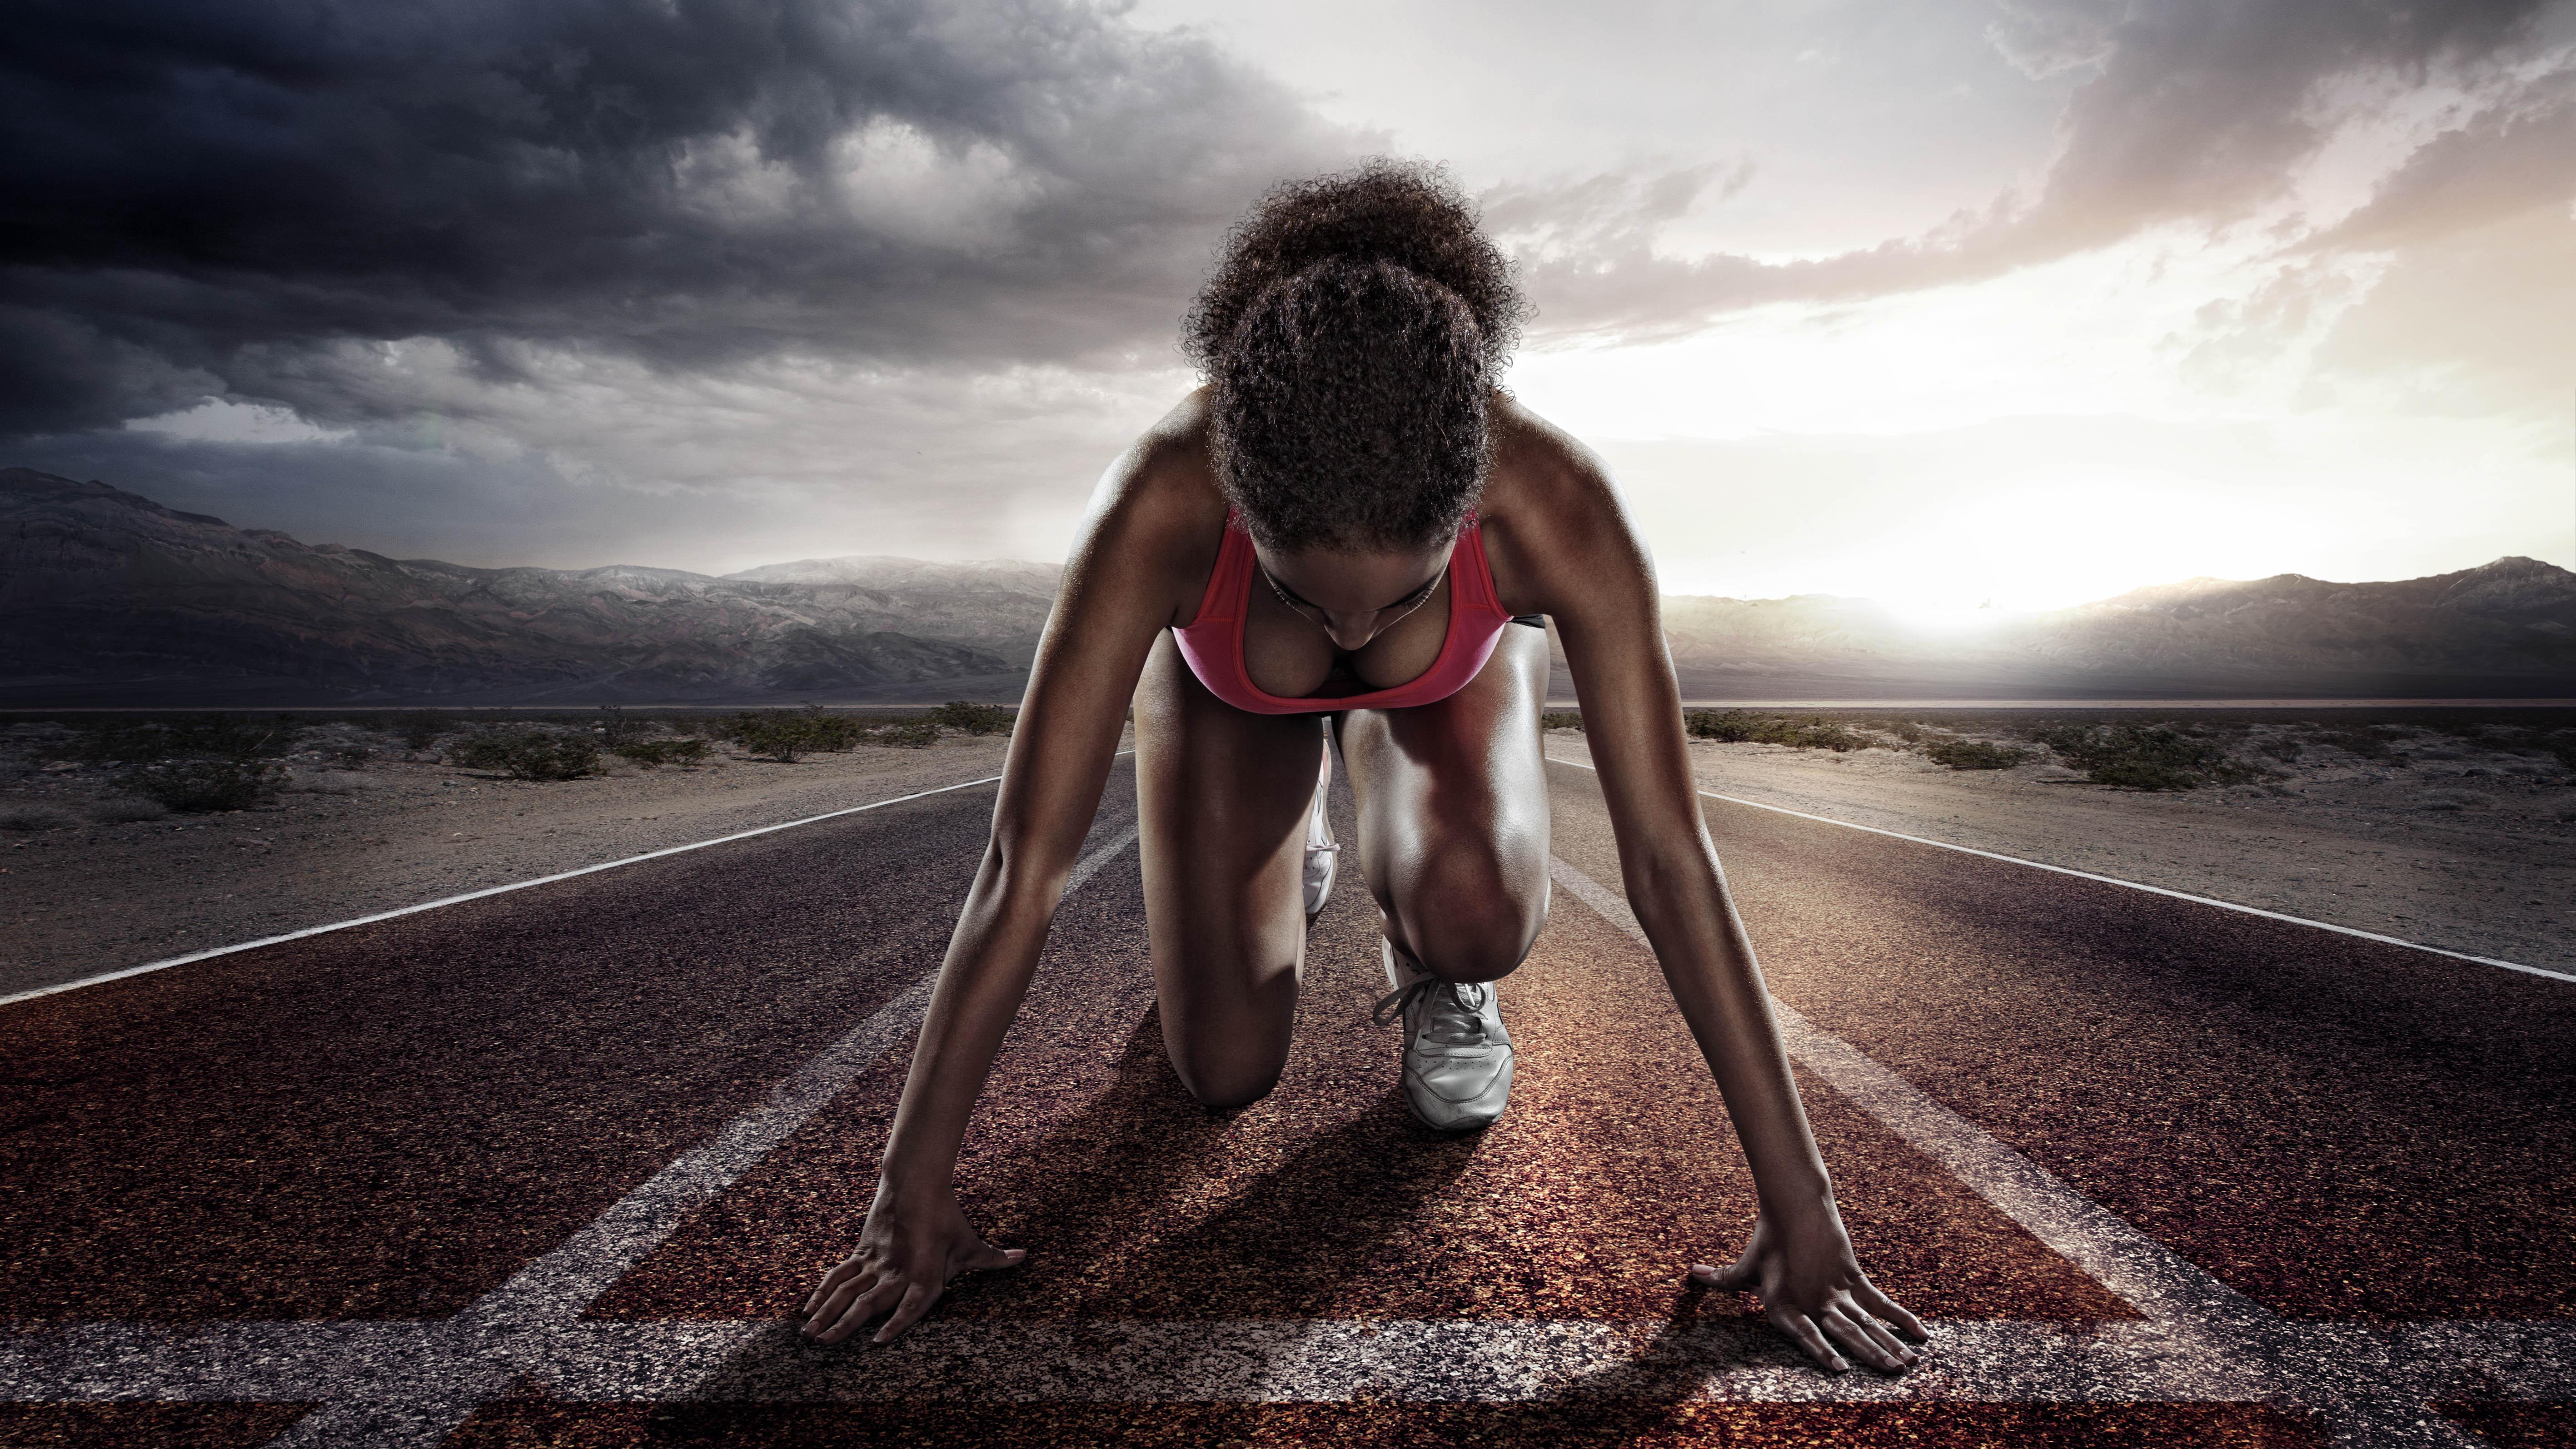 Mujeres atletas 03 - 3 part 8